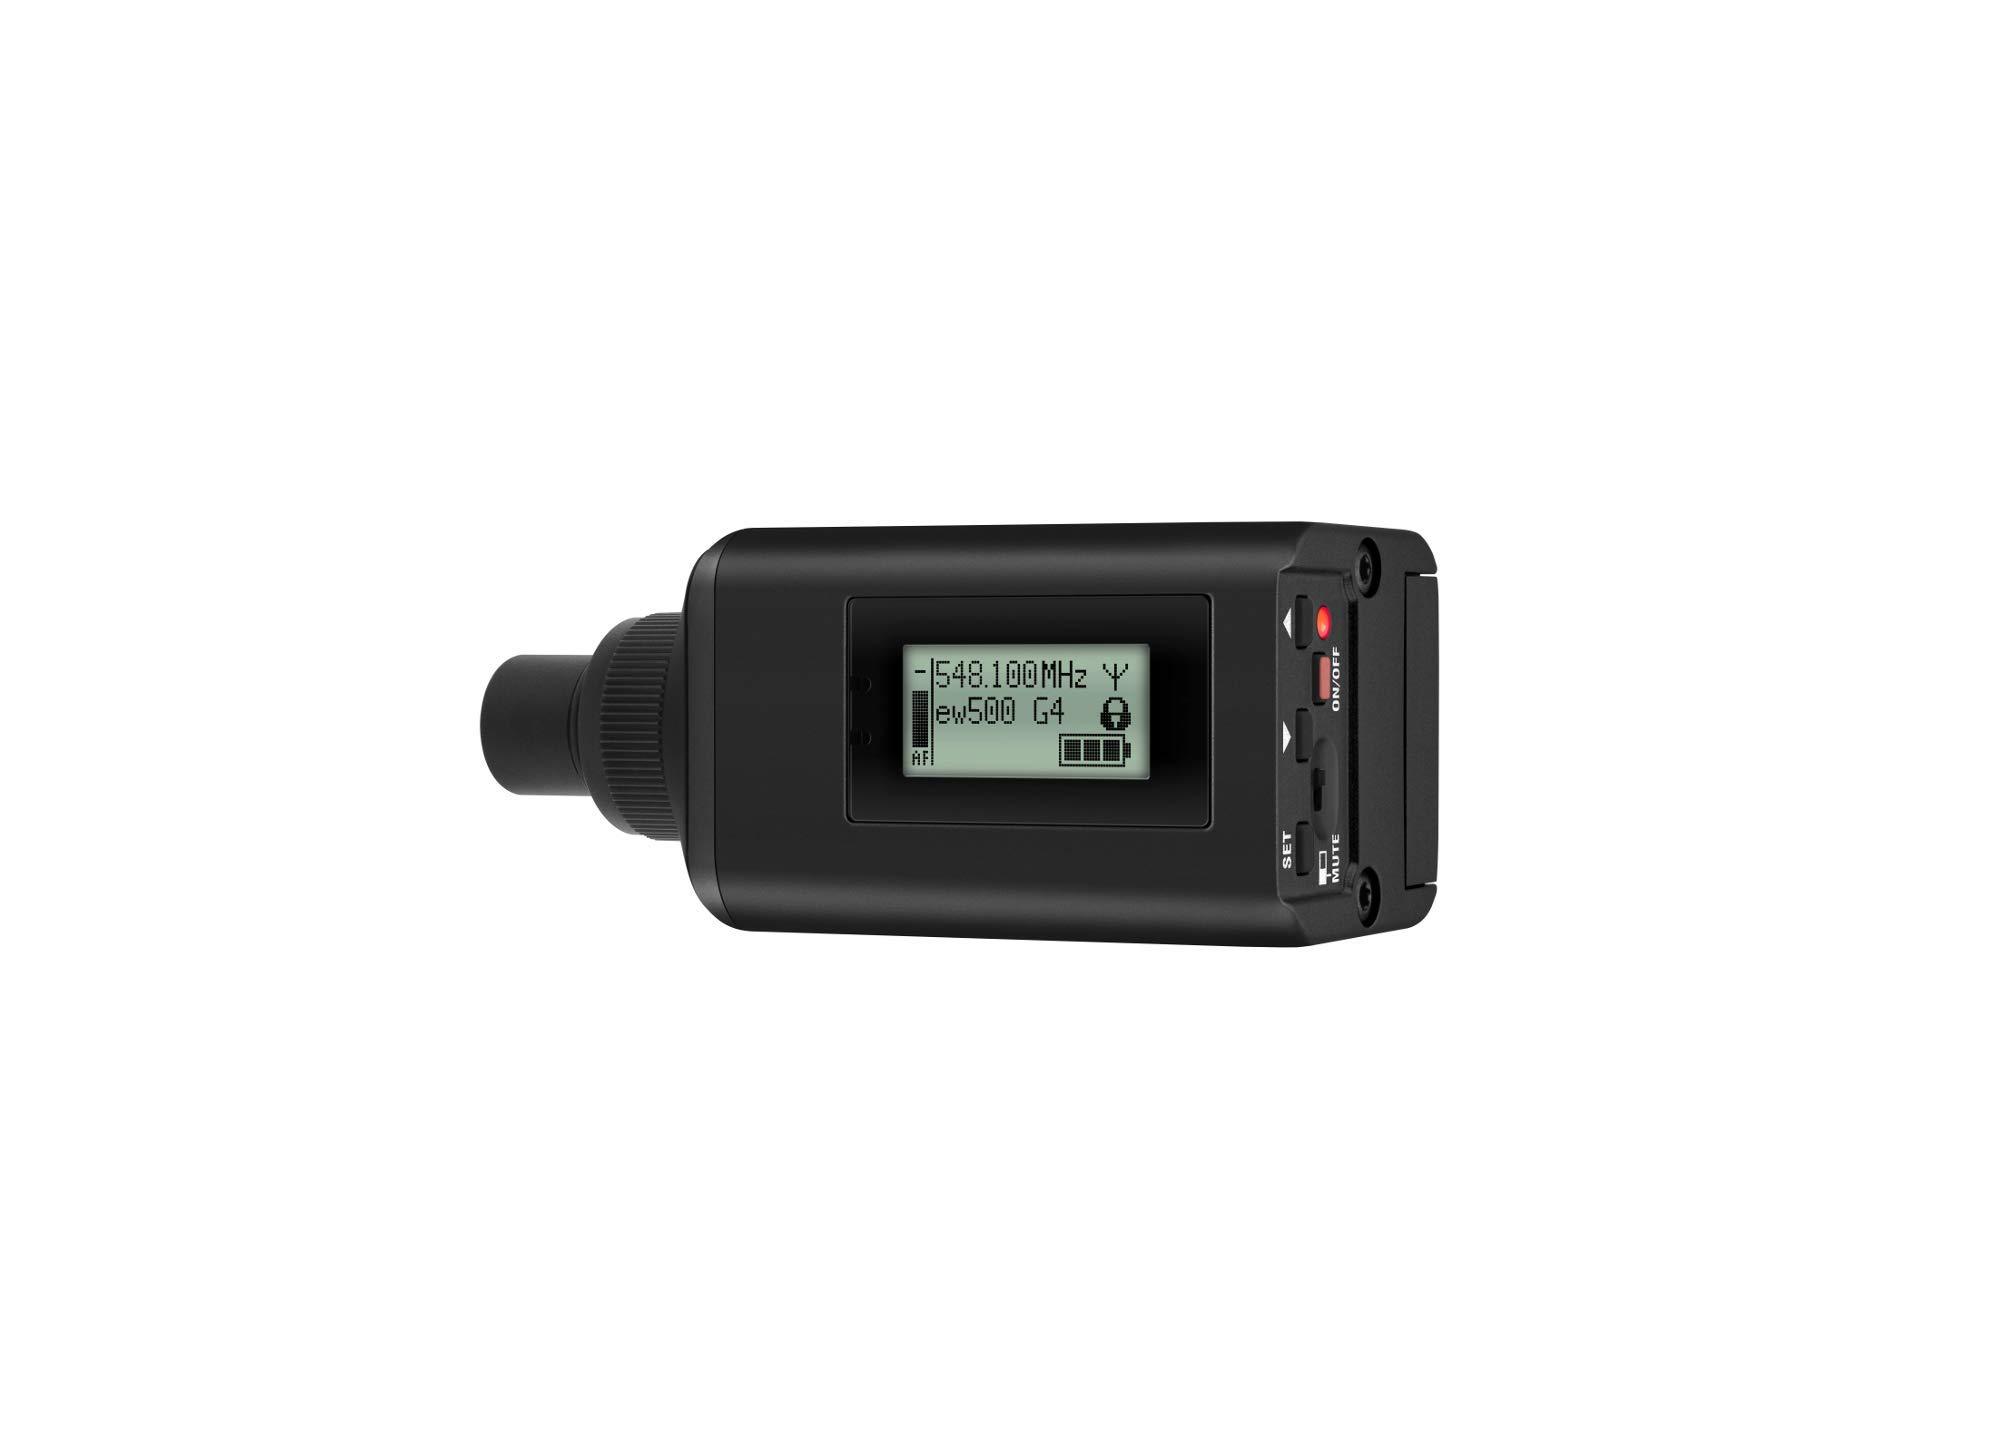 SKP 500 G4 Pro Wireless Plug-On Transmitter AW+: (470 to 558 MHz) by Sennheiser